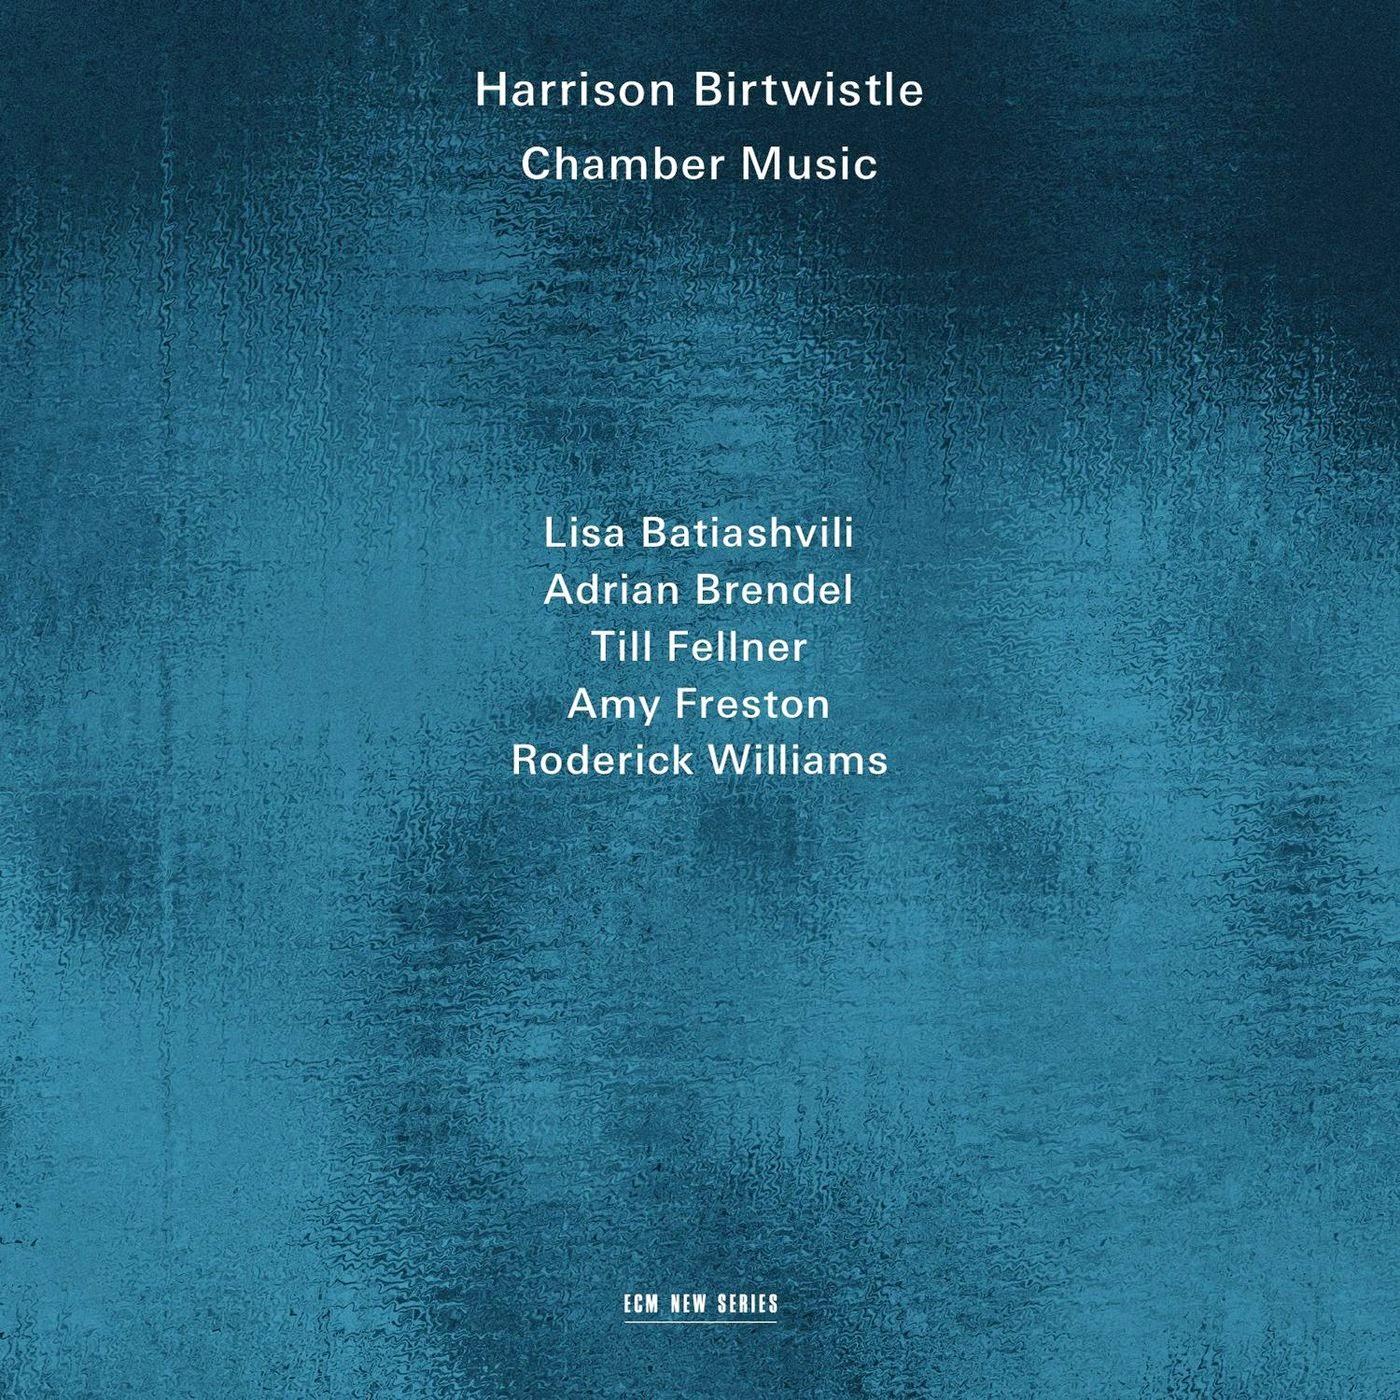 Harrison Birtwistle CHamber Music